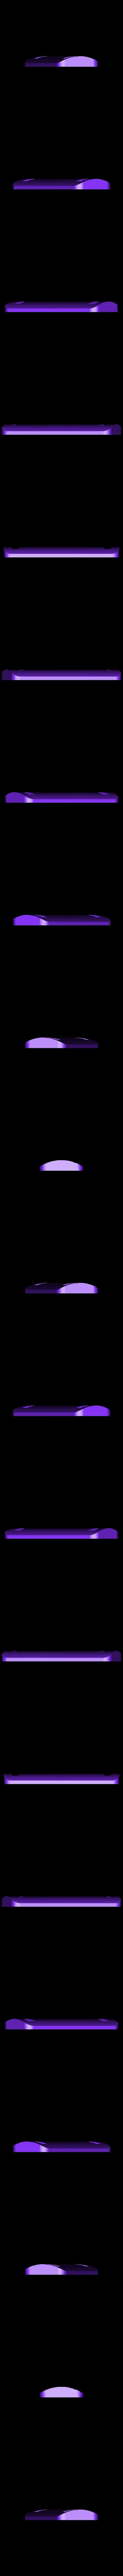 Support bobine LLH-traverse lg 60.STL Download free STL file Filament coil support • 3D print model, LLH